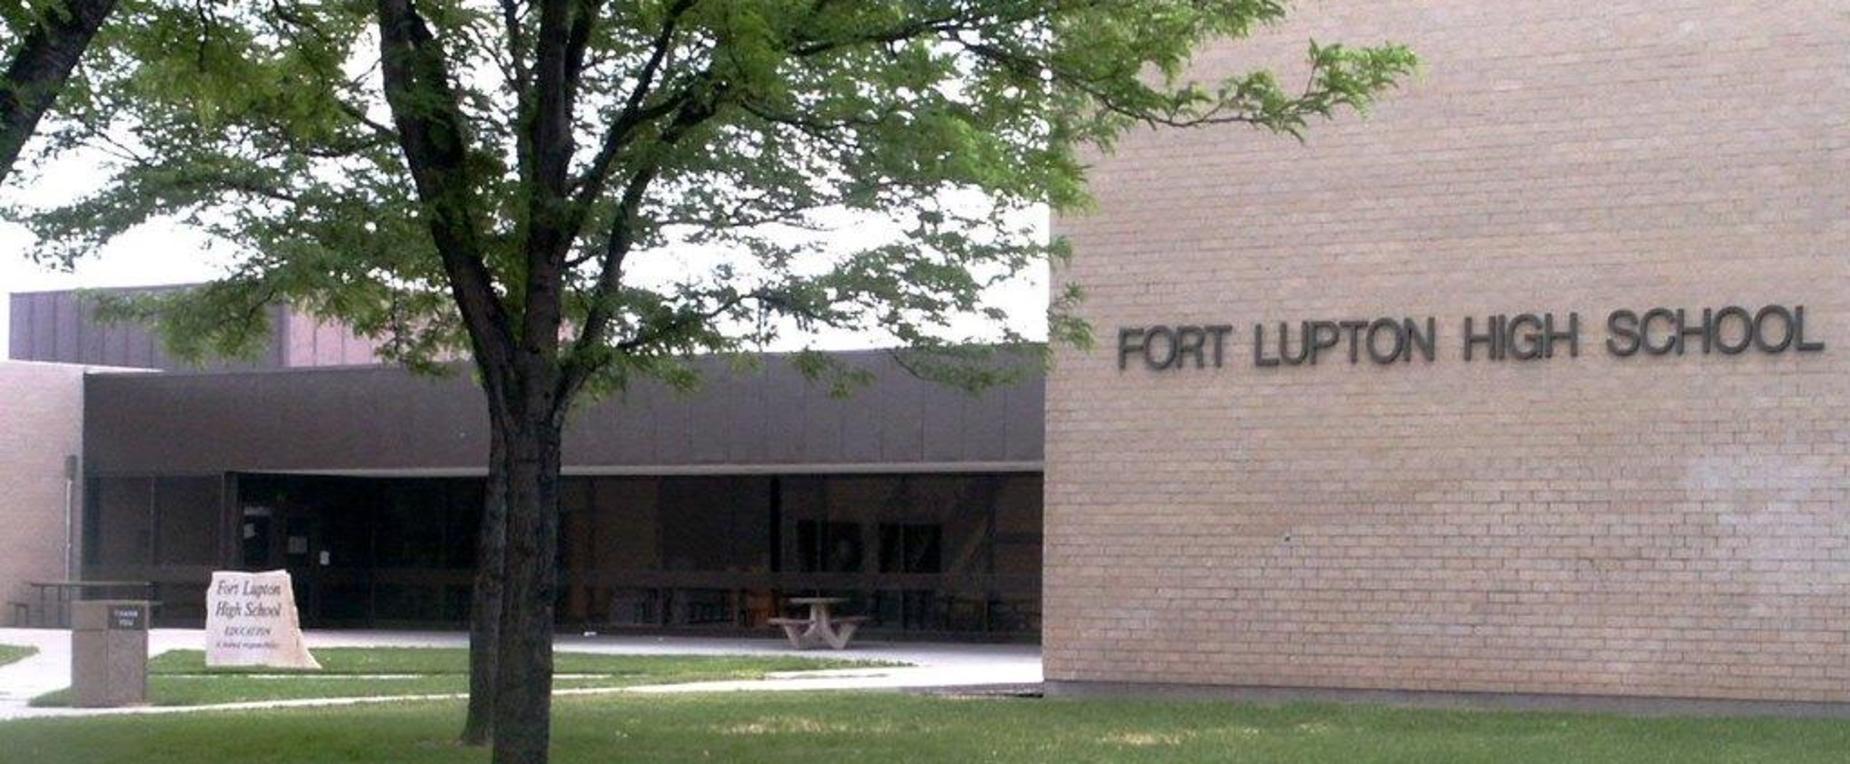 External view of Ft. Lupton High School